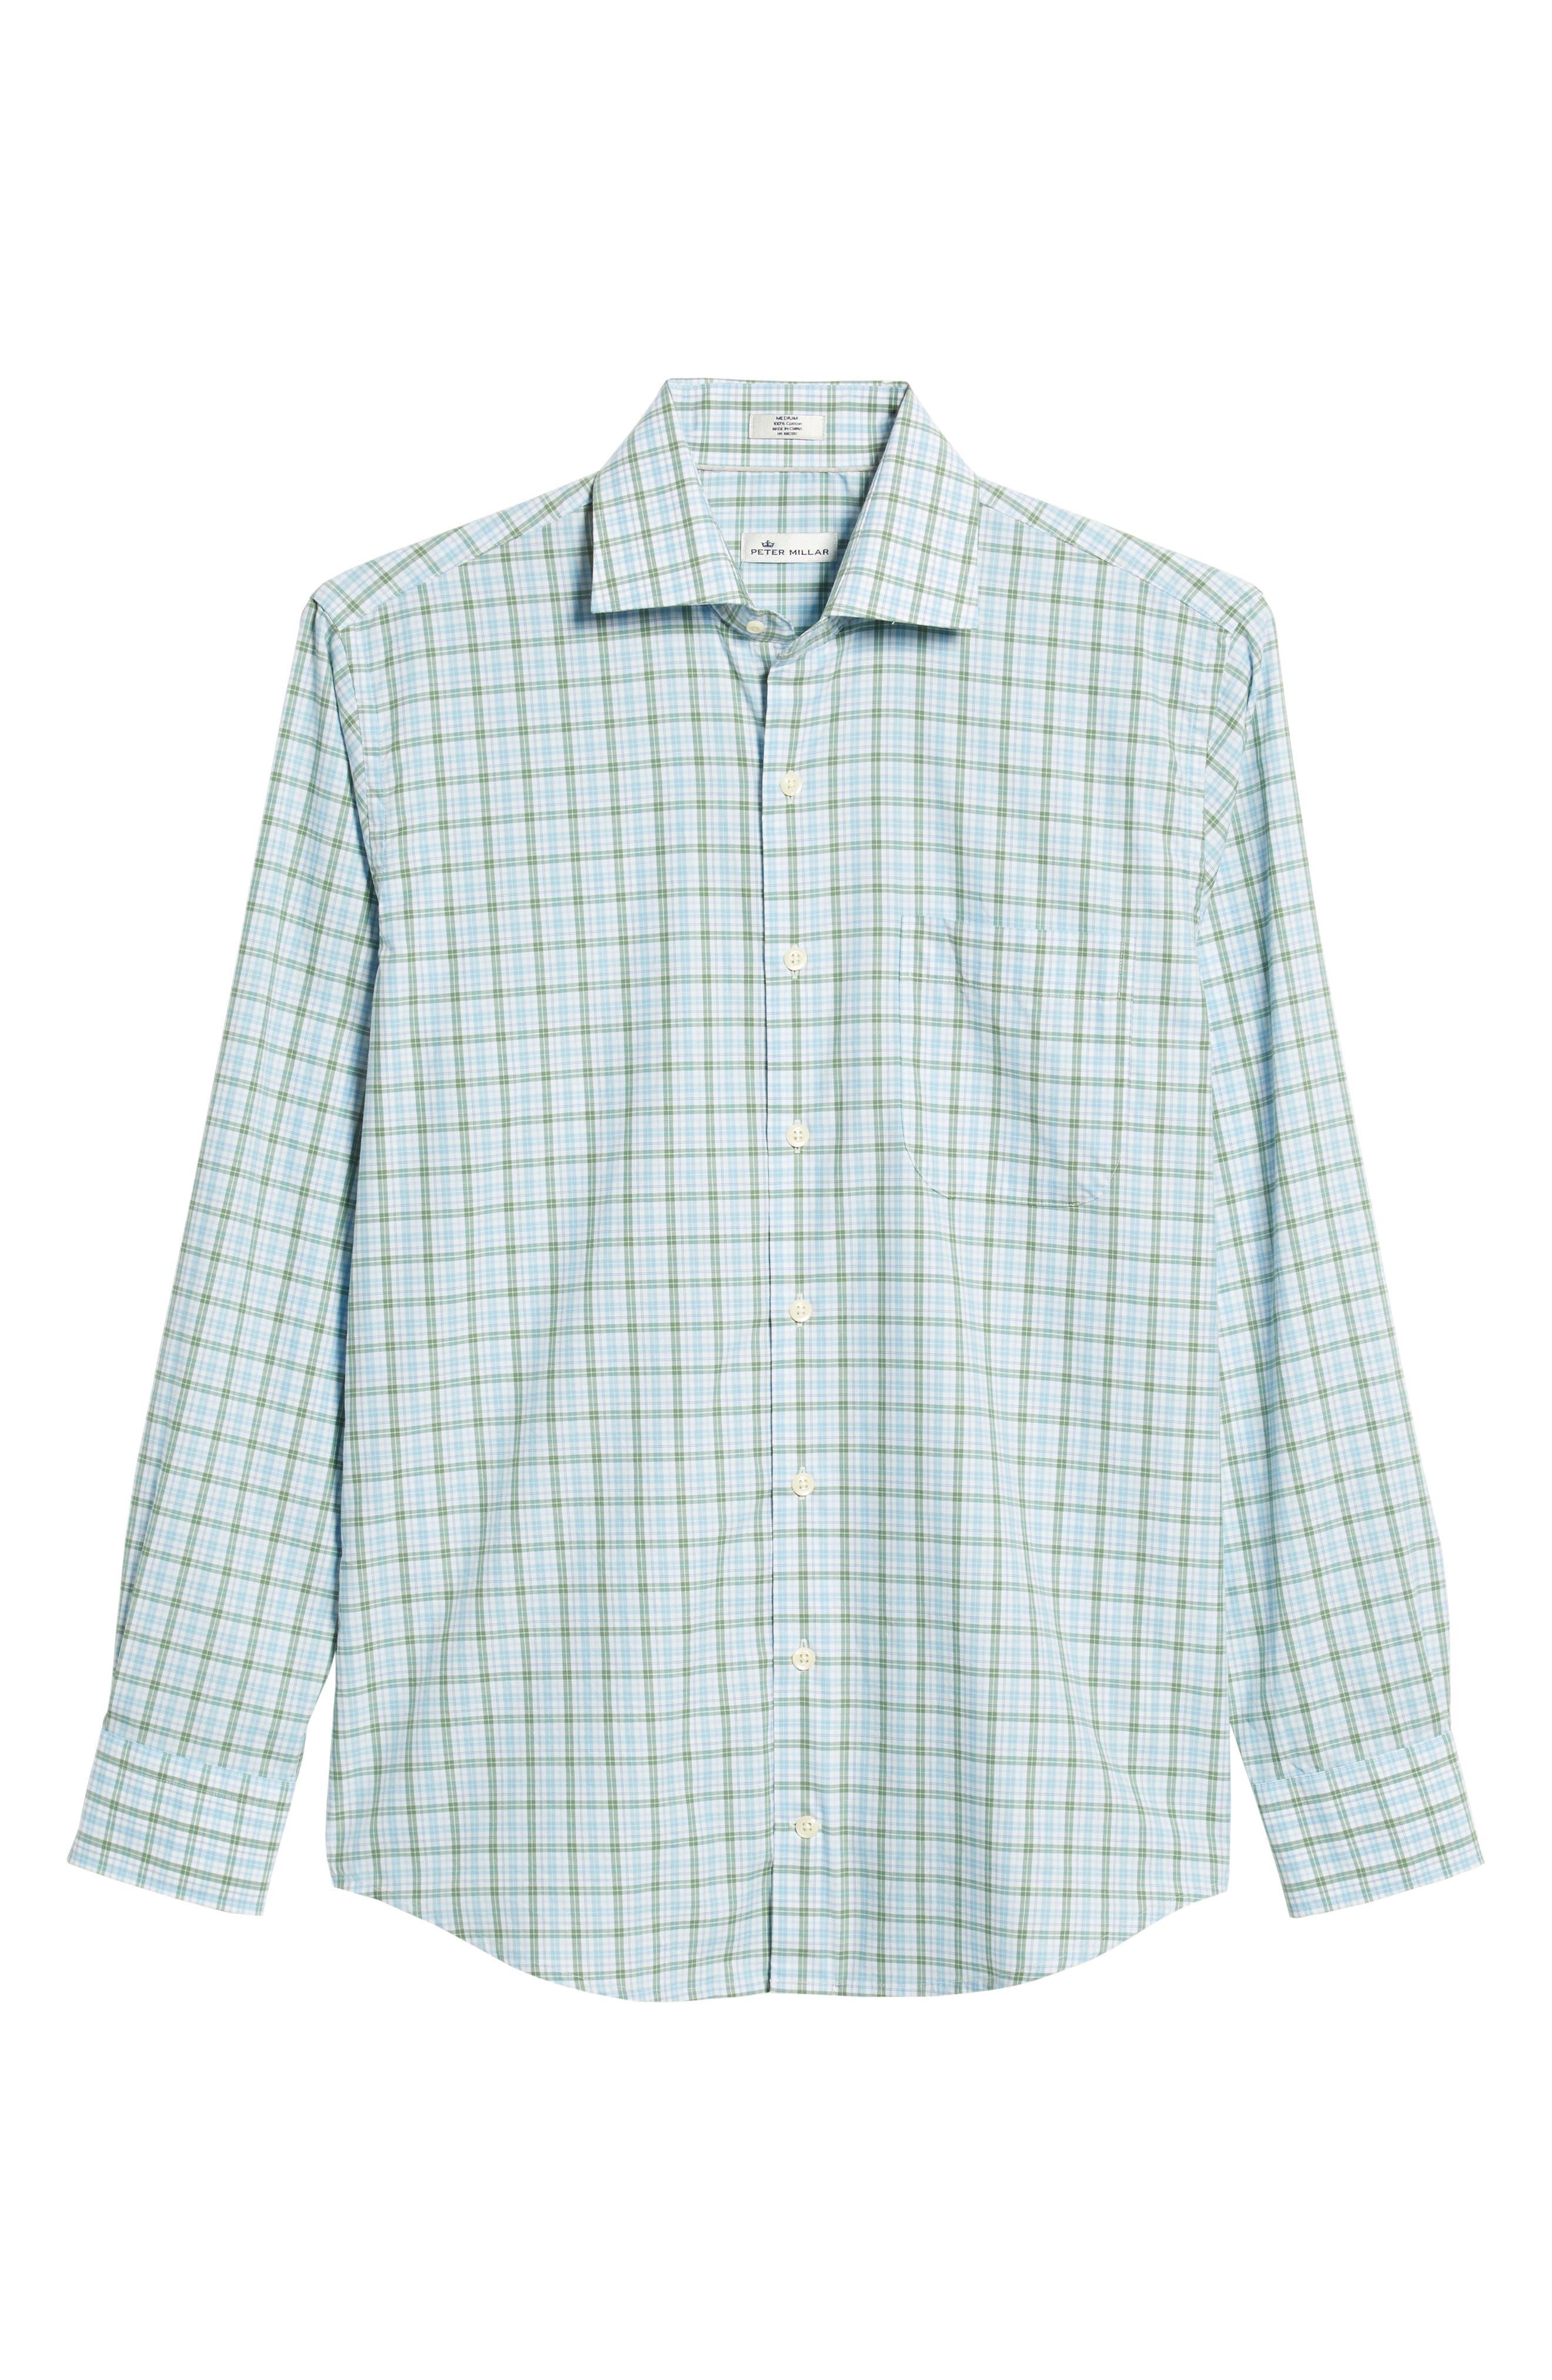 Crown Finish Linden Check Regular Fit Sport Shirt,                             Alternate thumbnail 5, color,                             BLUE